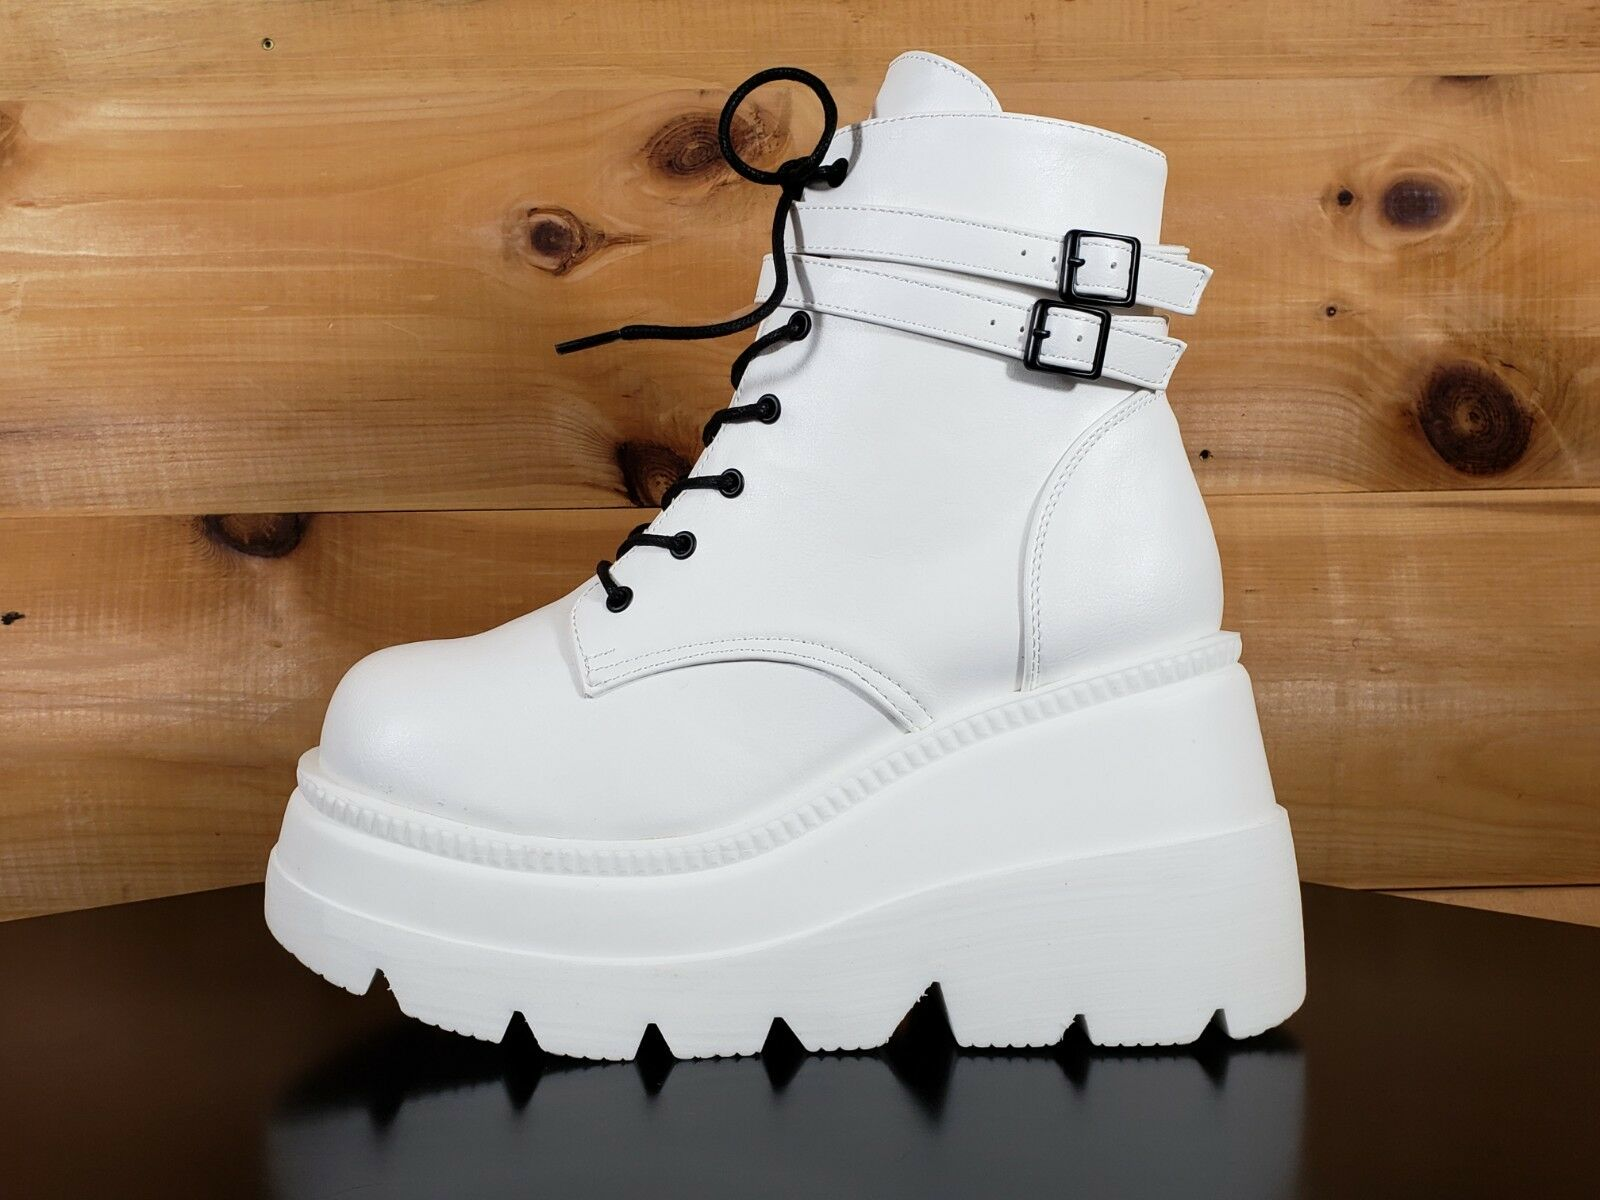 Demonia Demonia Demonia Shaker 52 Weiß Platform 4.5  Wedge Heel Ankle Stiefel Größes 8 11 & 12 2a99e3